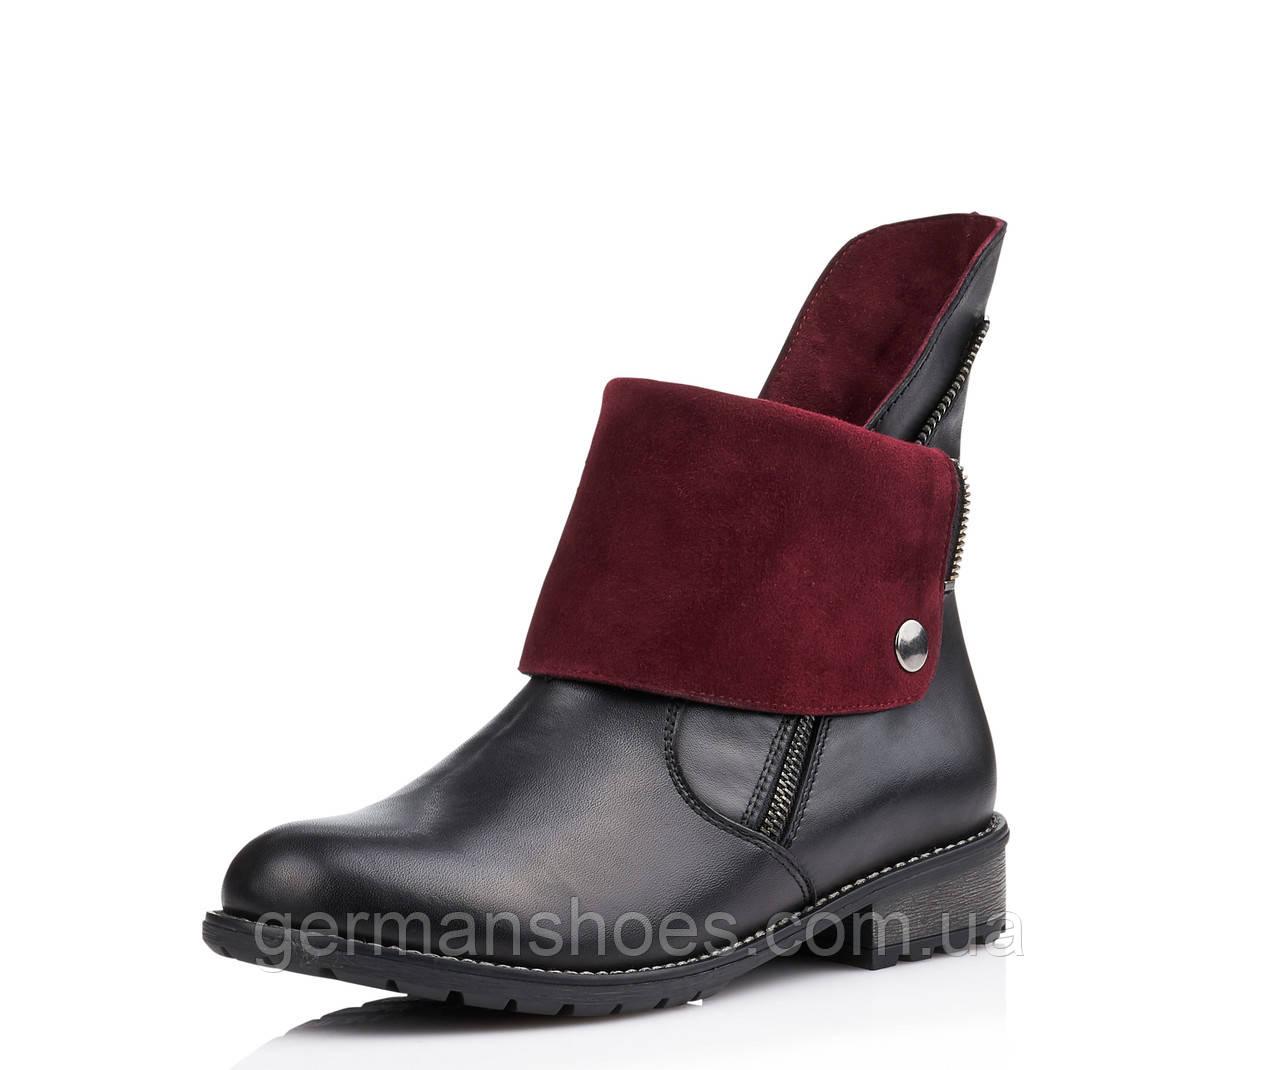 Ботинки женские Remonte R3317-01